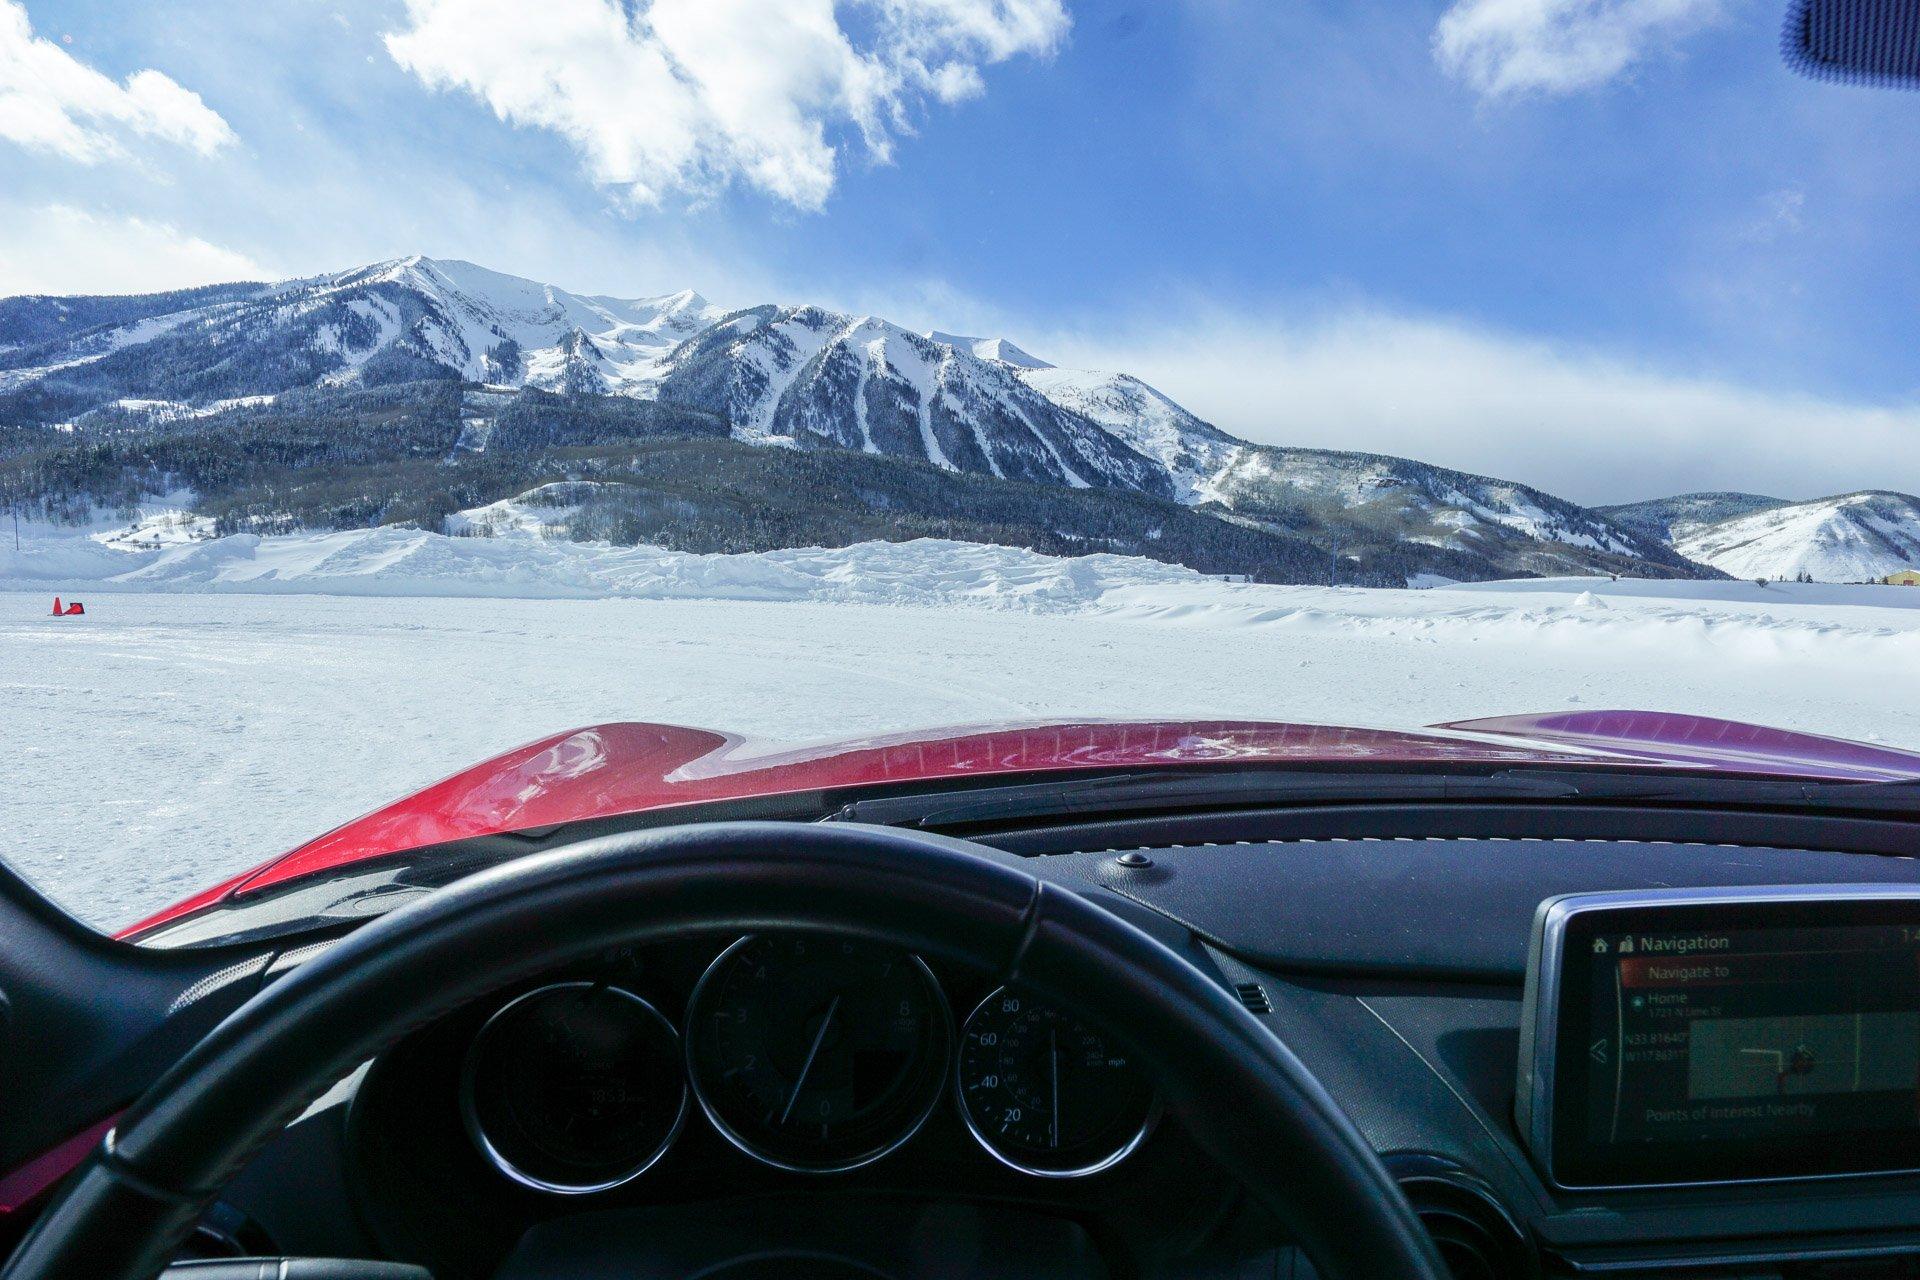 Miata Ice Drifting